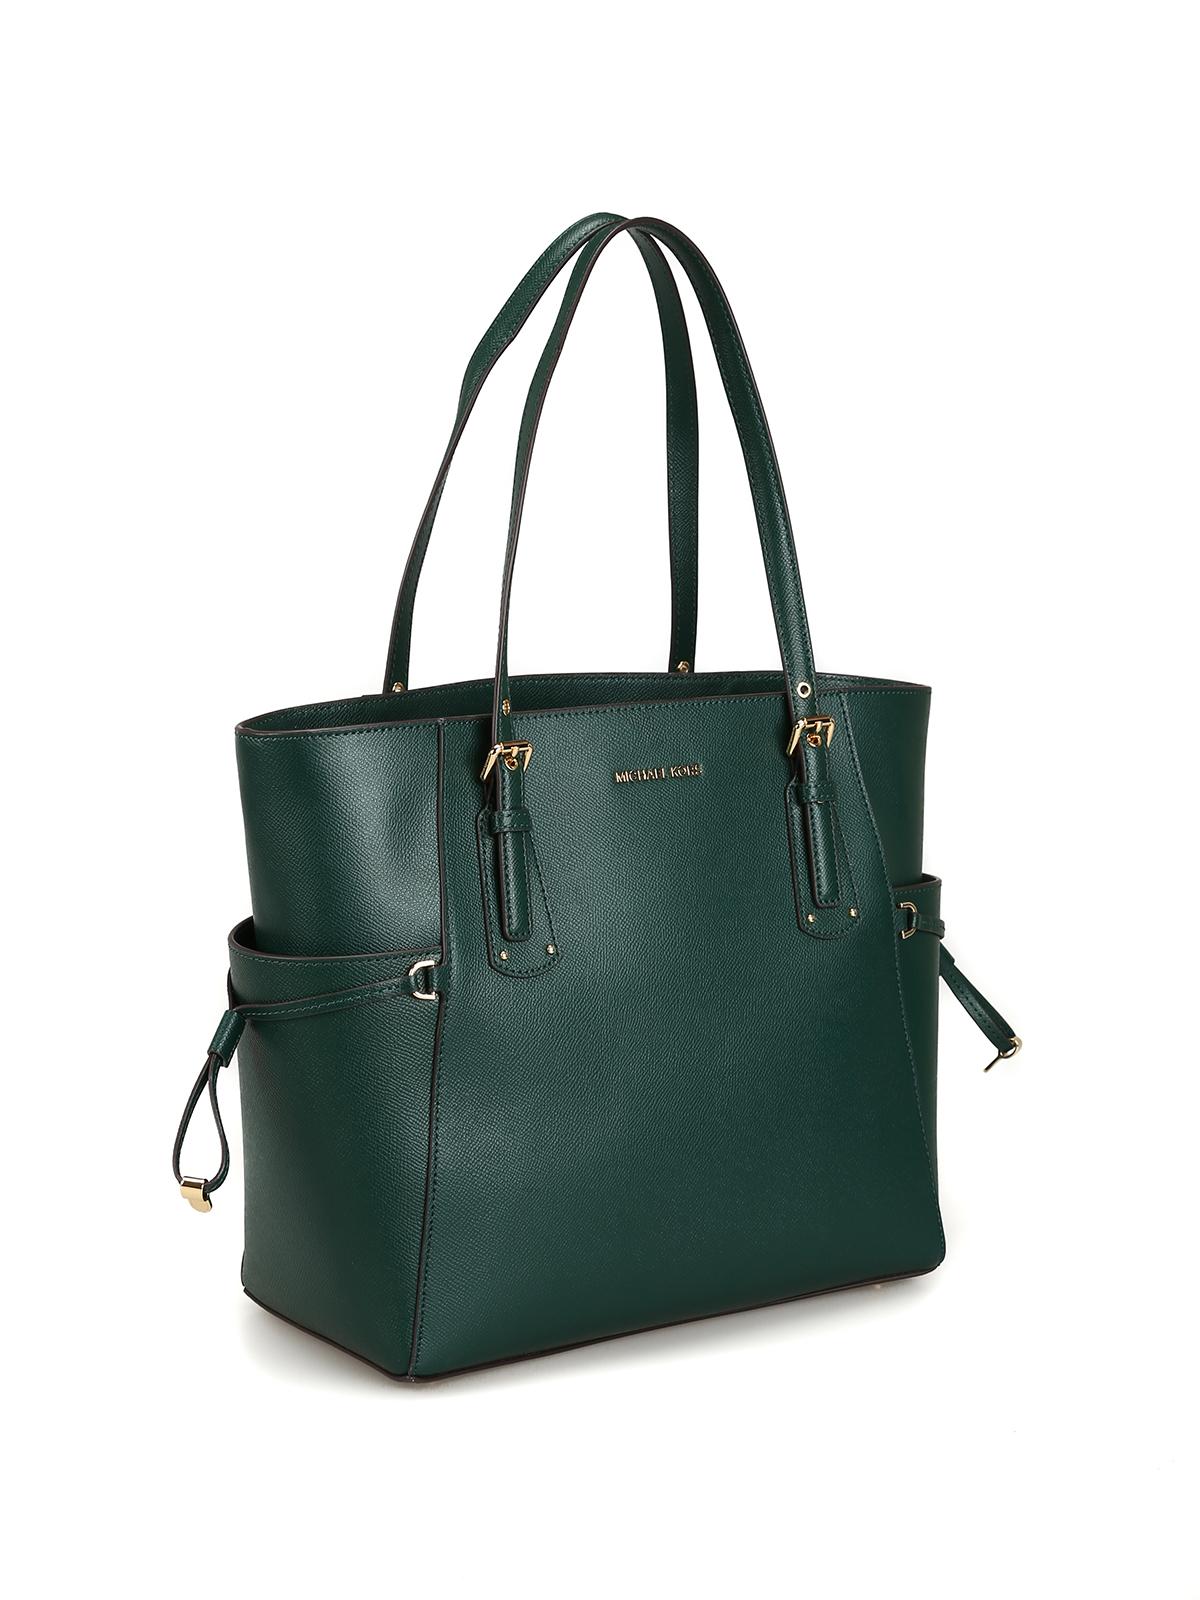 660fda5c80662b MICHAEL KORS: totes bags online - Voyager S dark green grainy leather bag